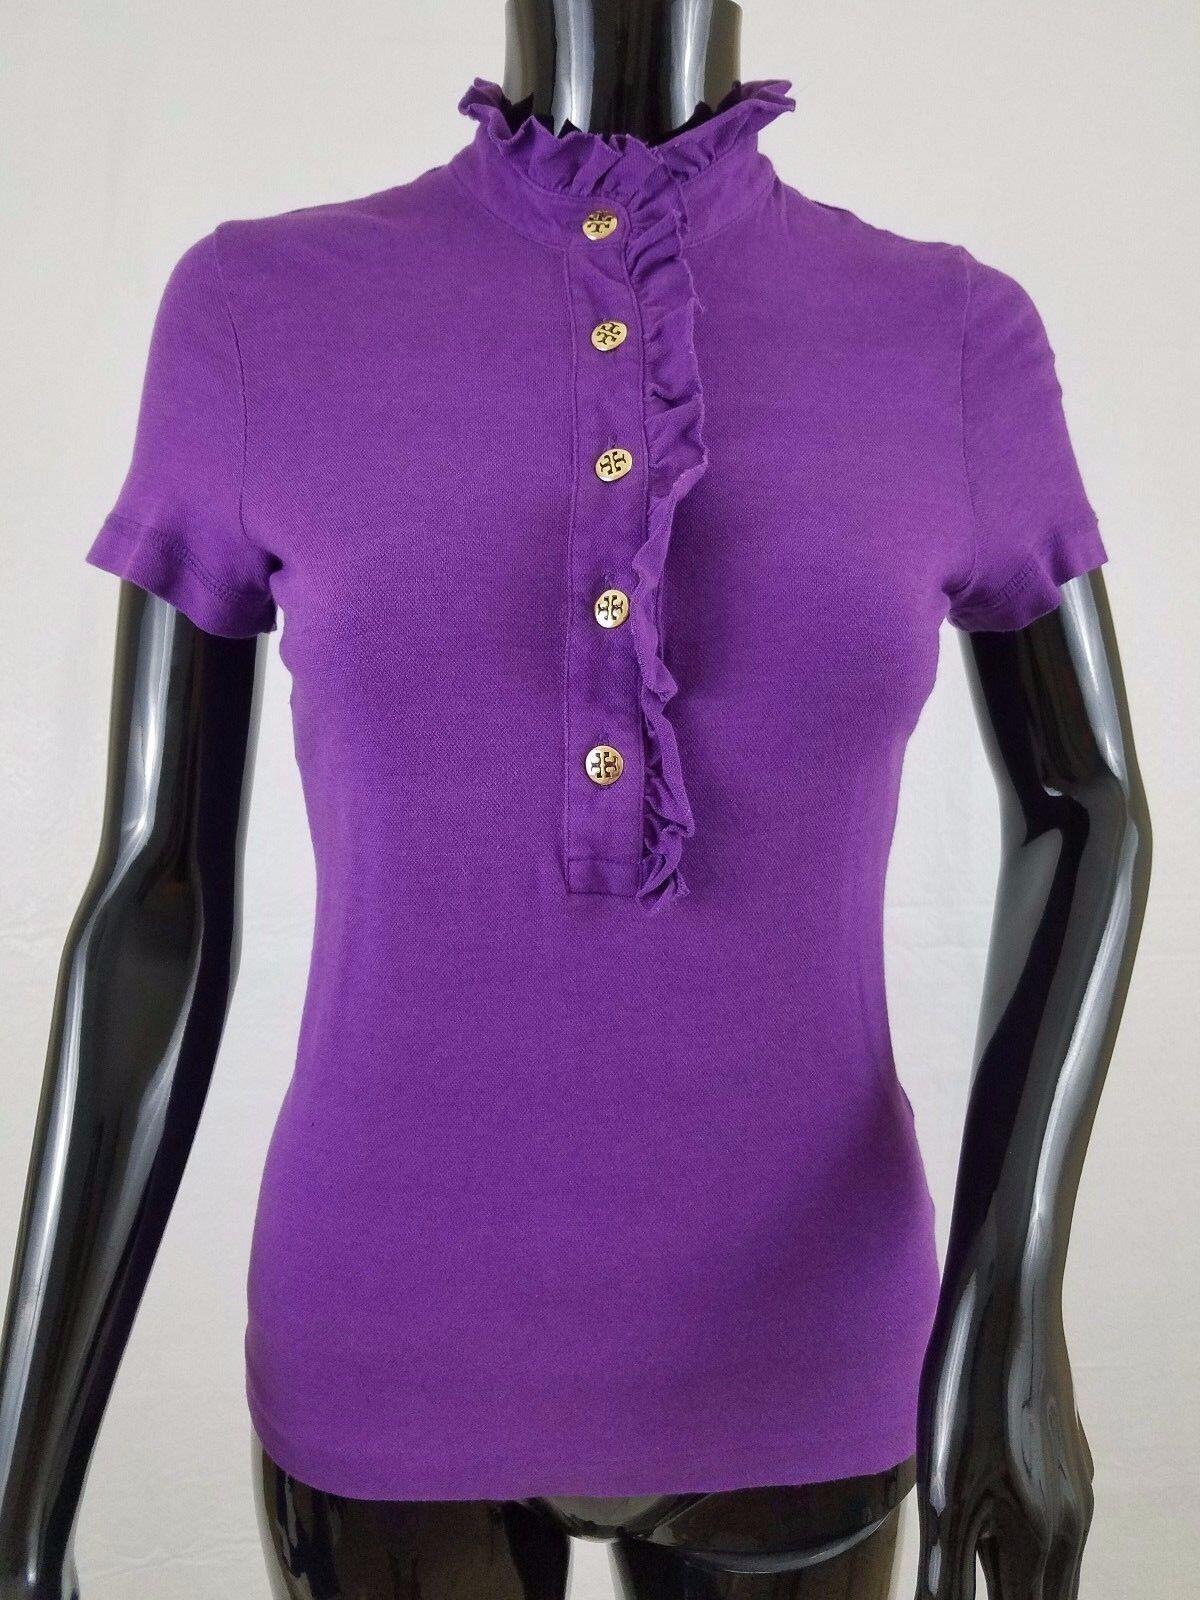 Tory Burch Blouse Top Size Extra Small Purple Pima Cotton Blend Half Button